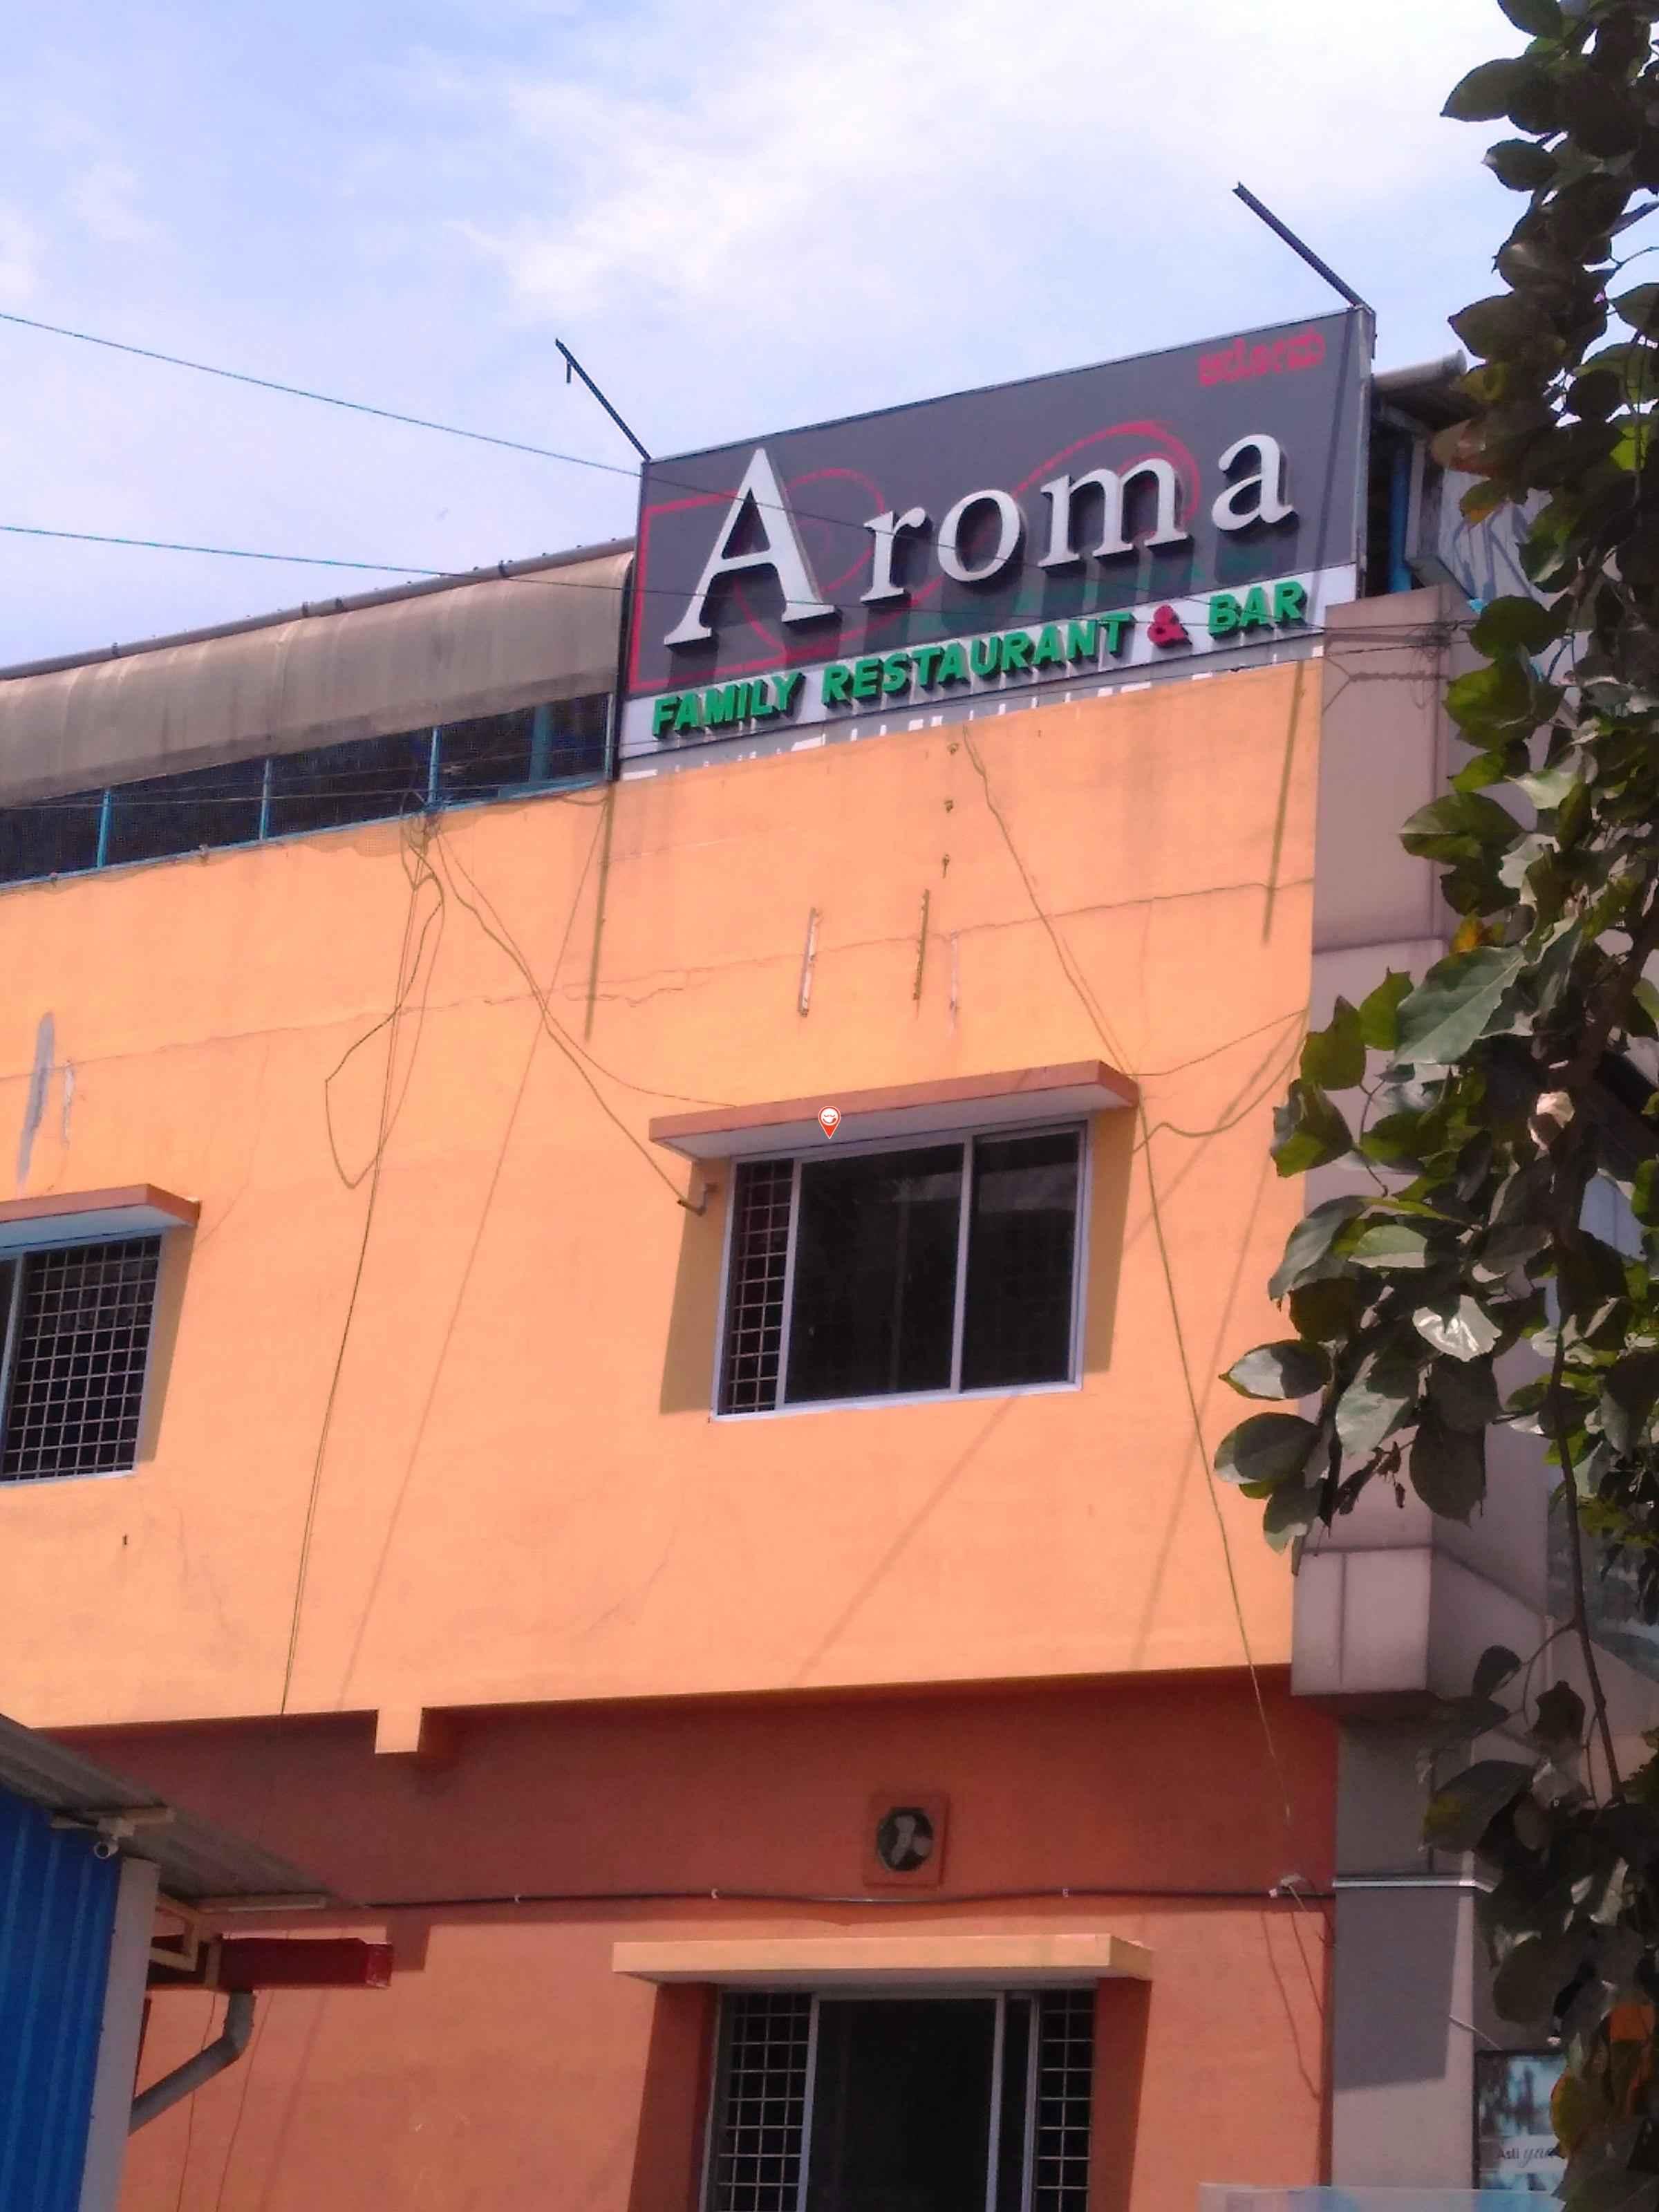 Aroma Family restara - KR Puram - Bangalore Image